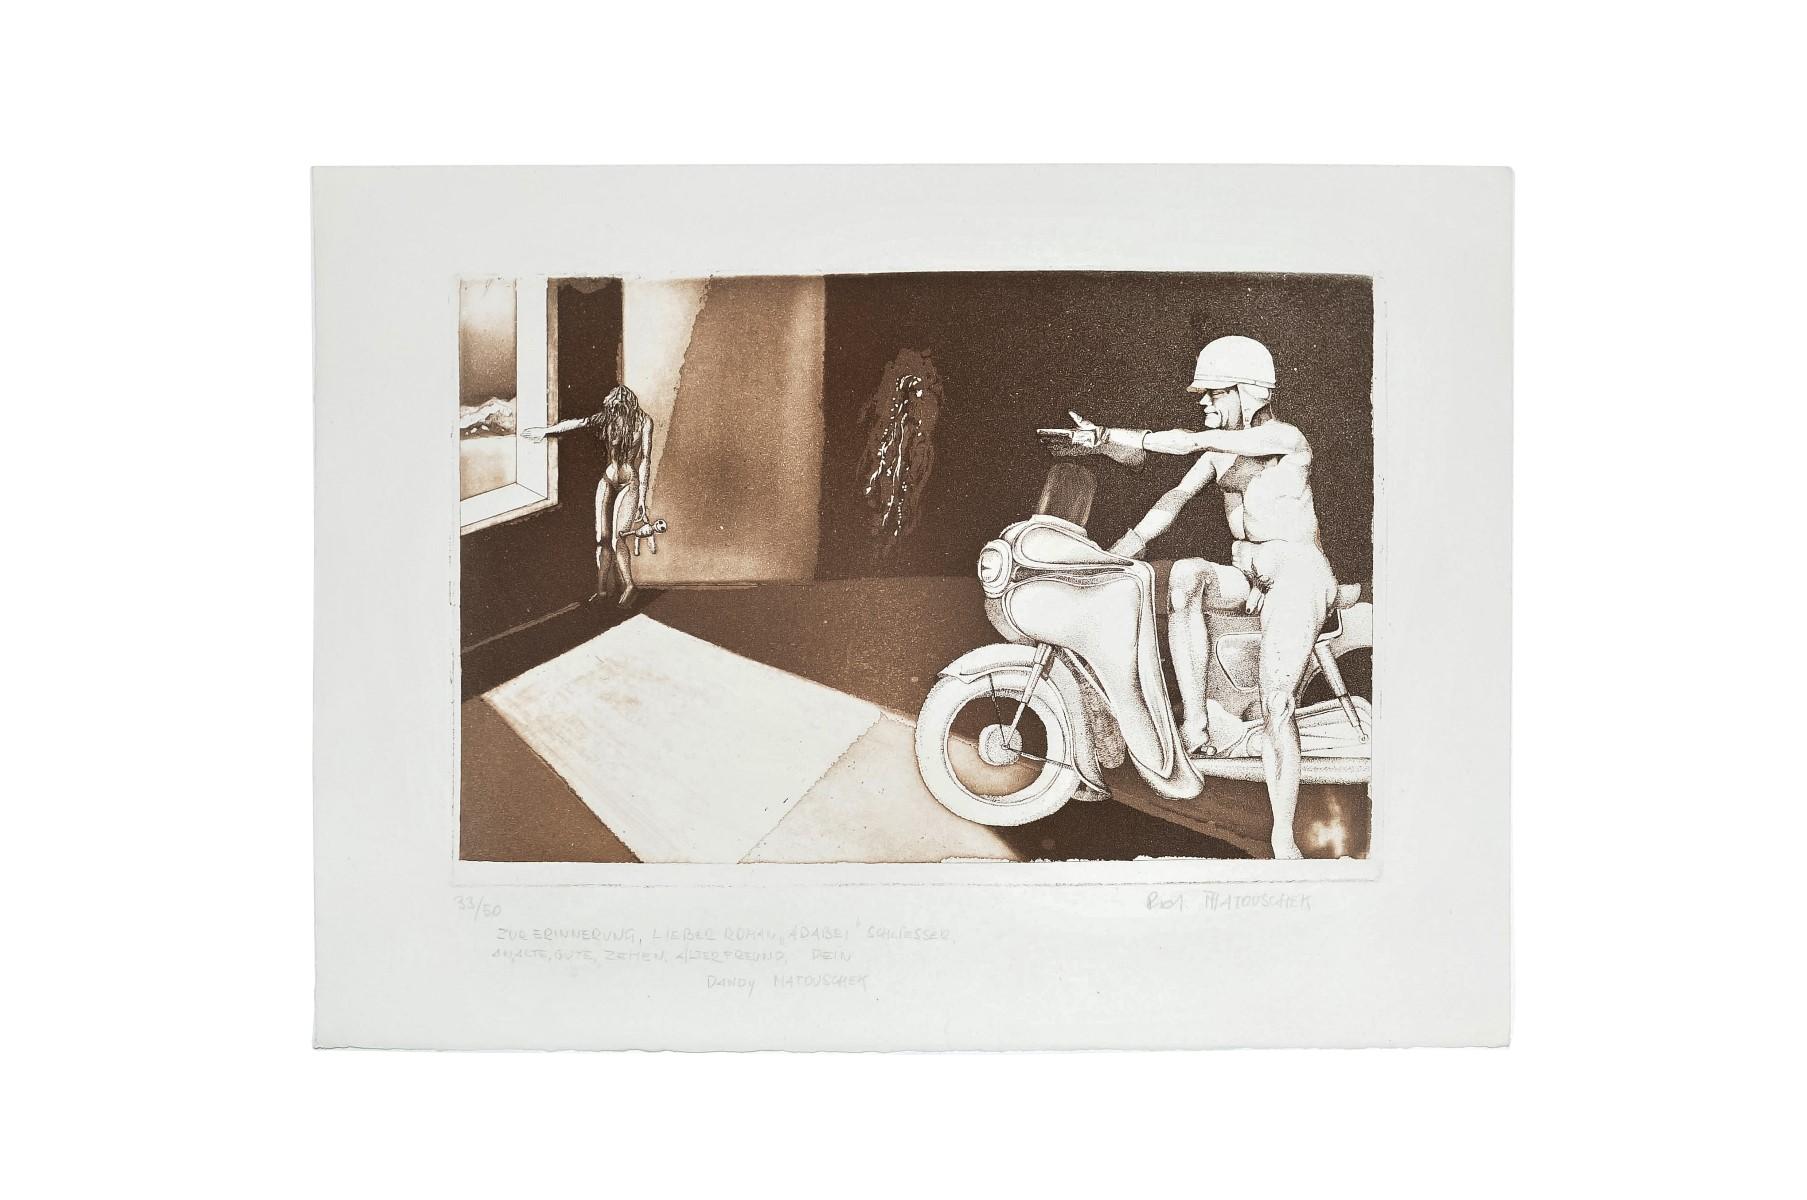 #15 Dandy Matouschek, Motorcyclist | Dandy Matouschek, Motorradfahrer Image